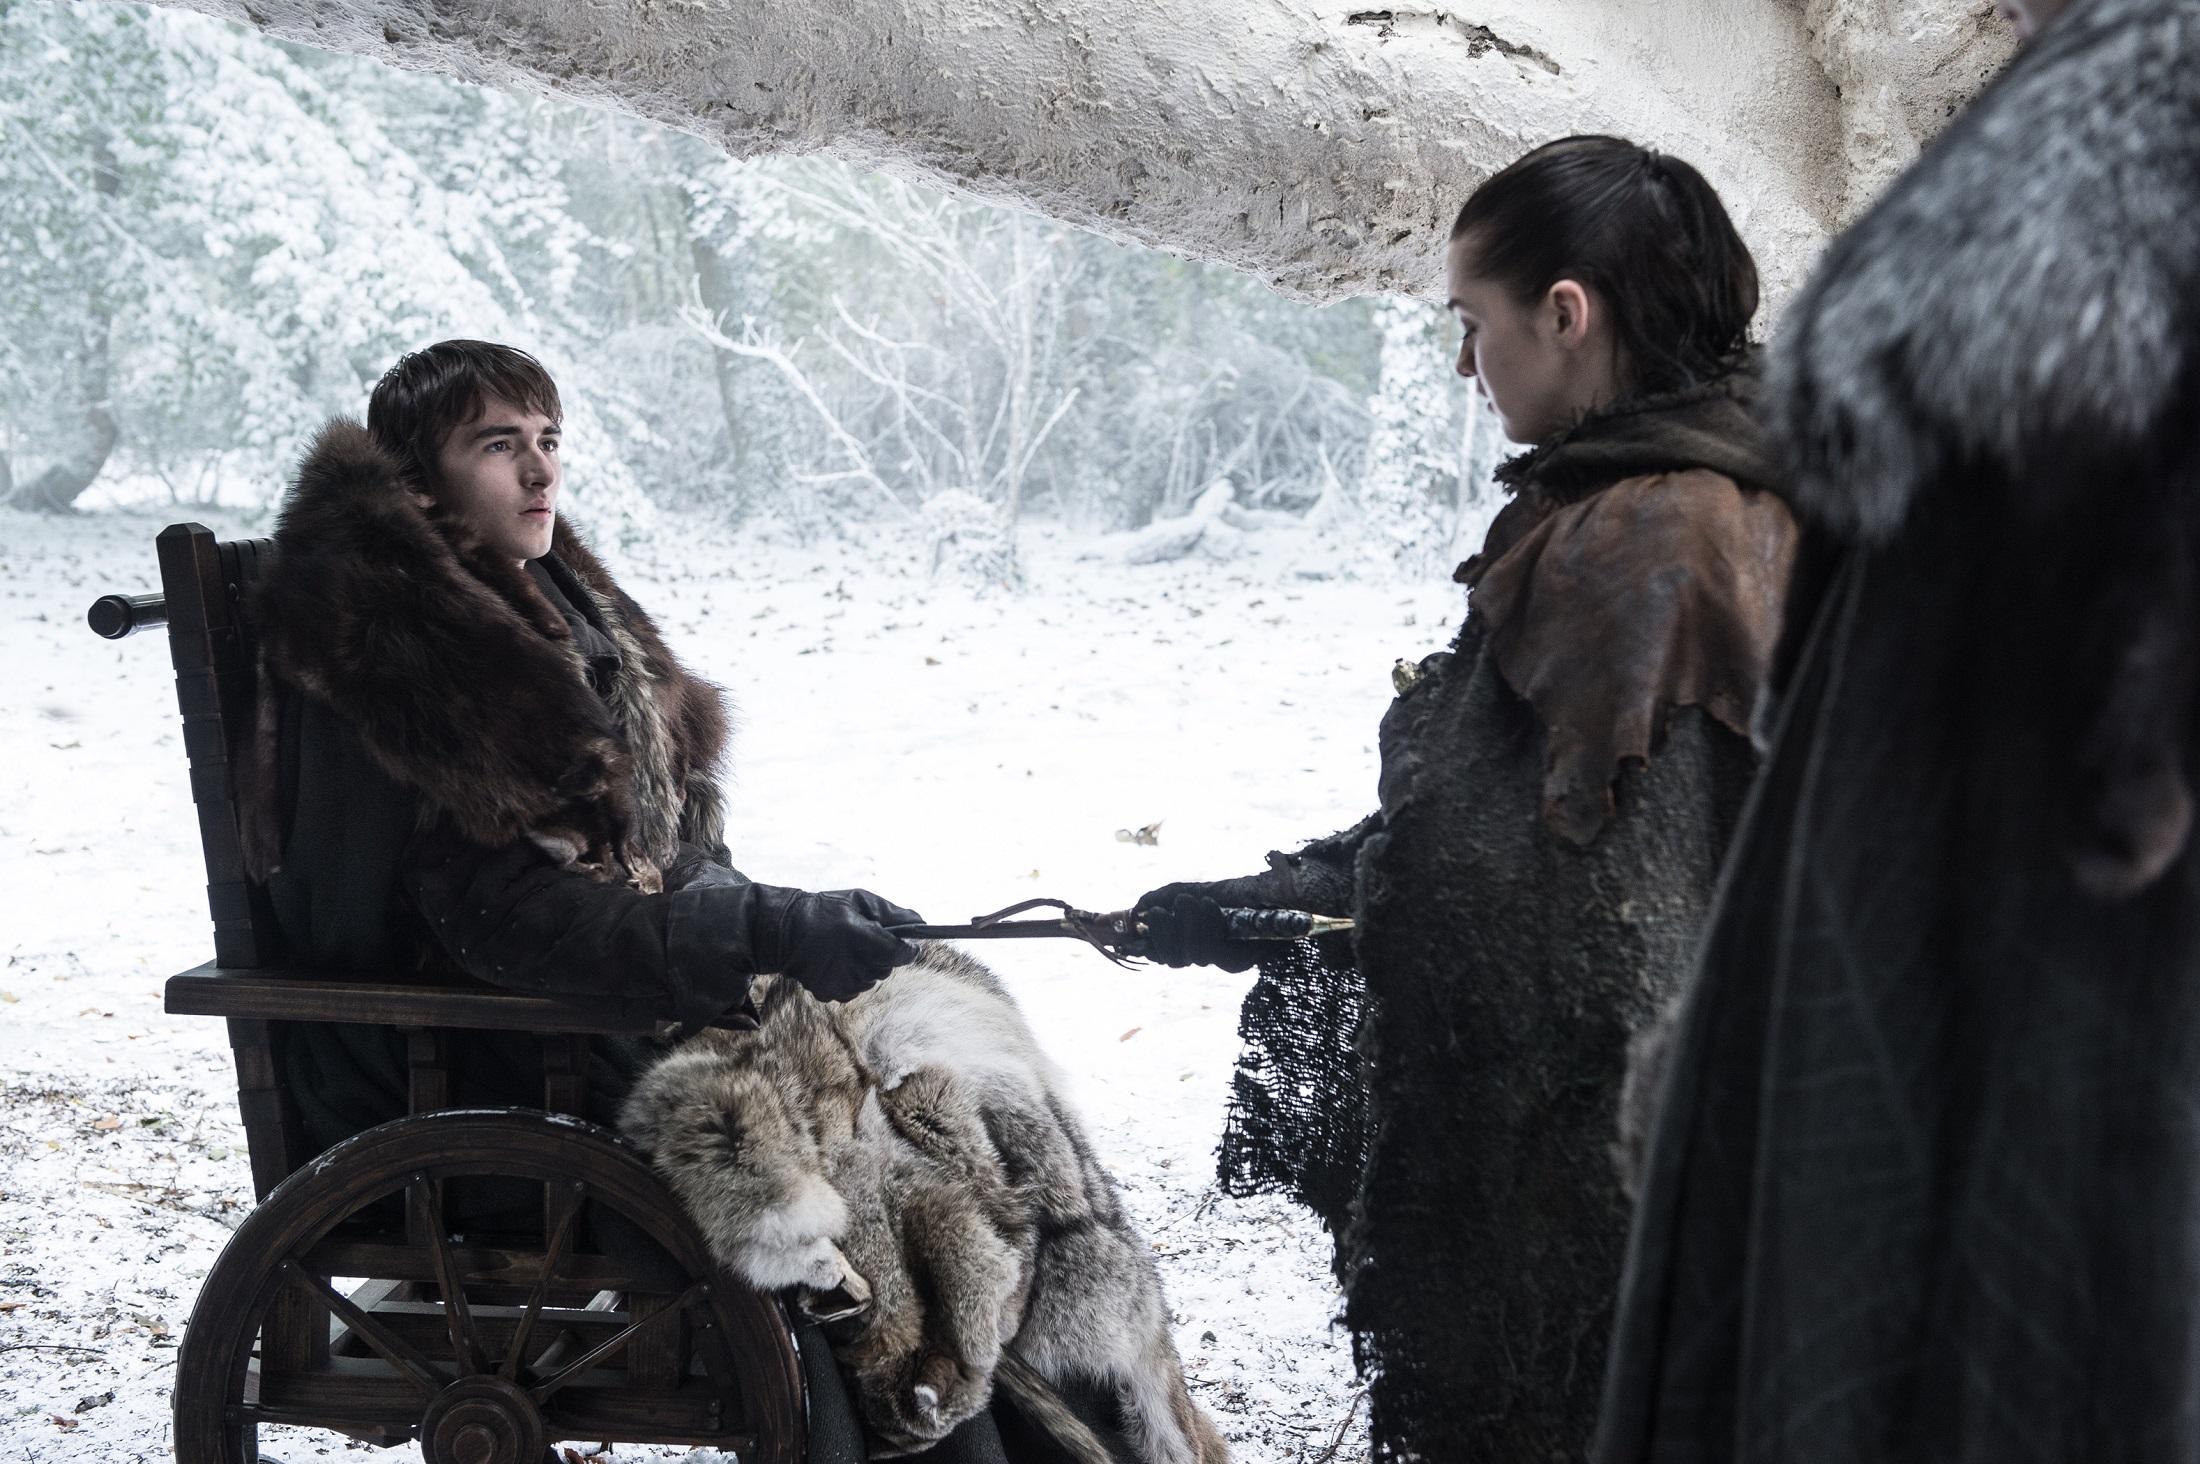 Game of Thrones Season 7 Episode 4 – The Spoils of War Recap